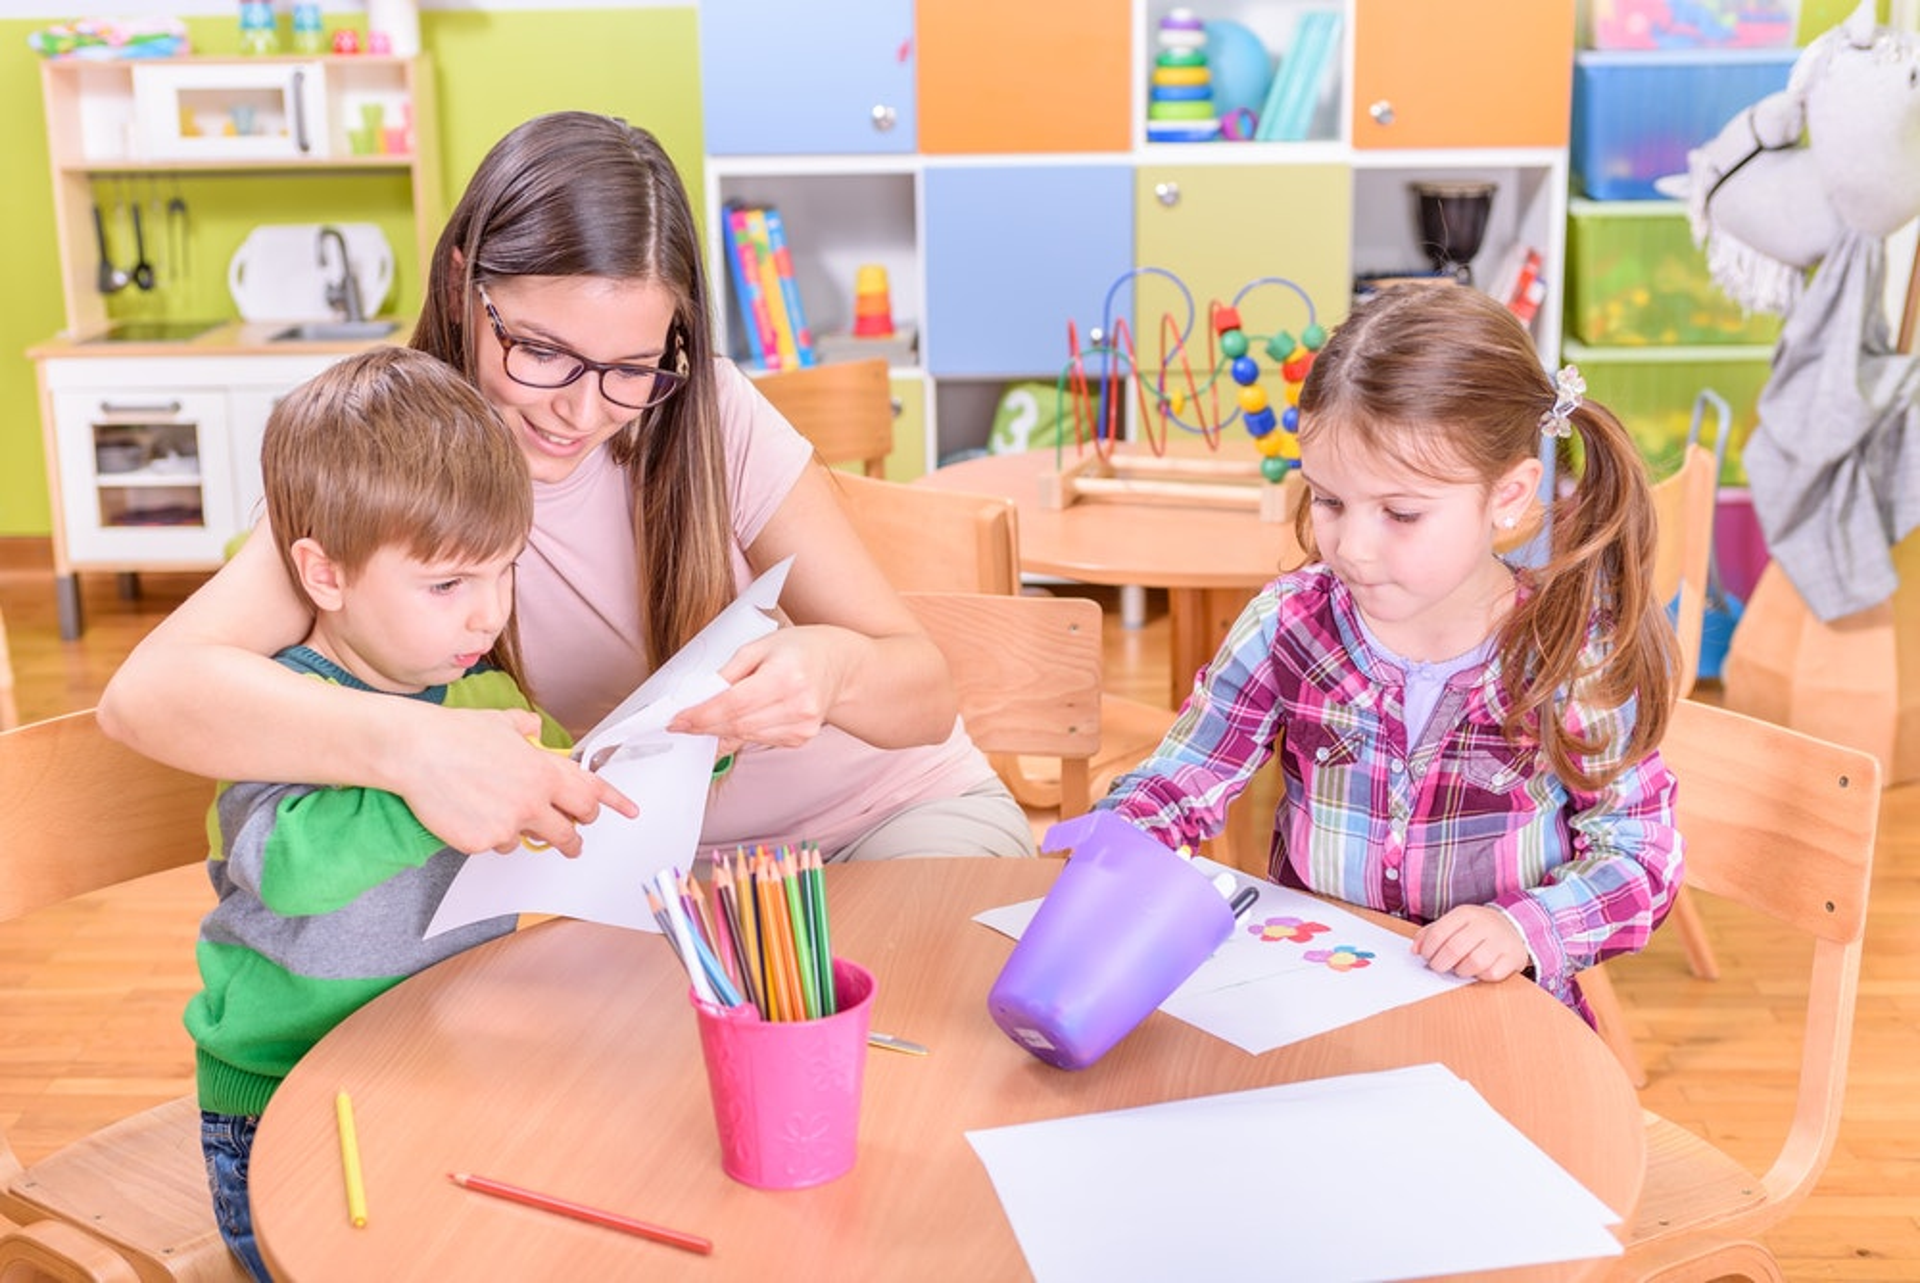 Teaching Kids 21st Century Skills Early Will Help Prepare Them For